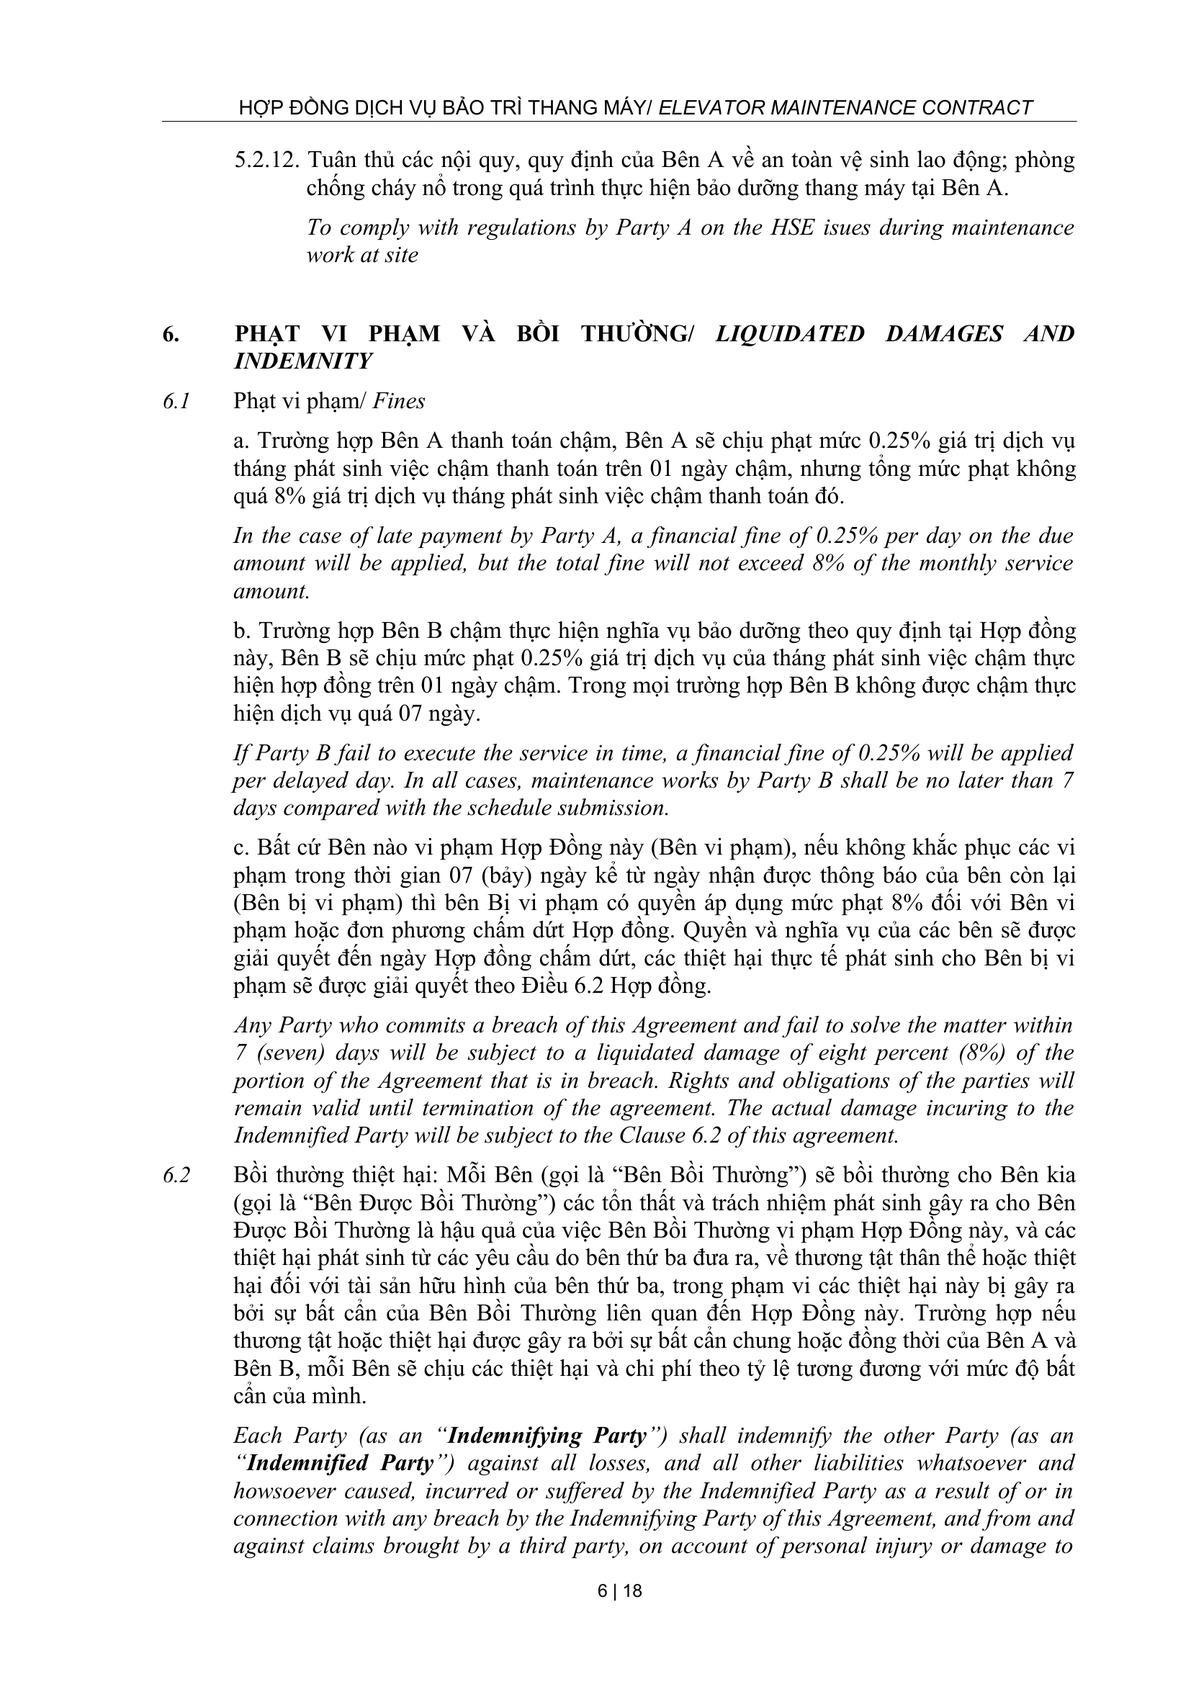 Maintenance Service Agreement-5